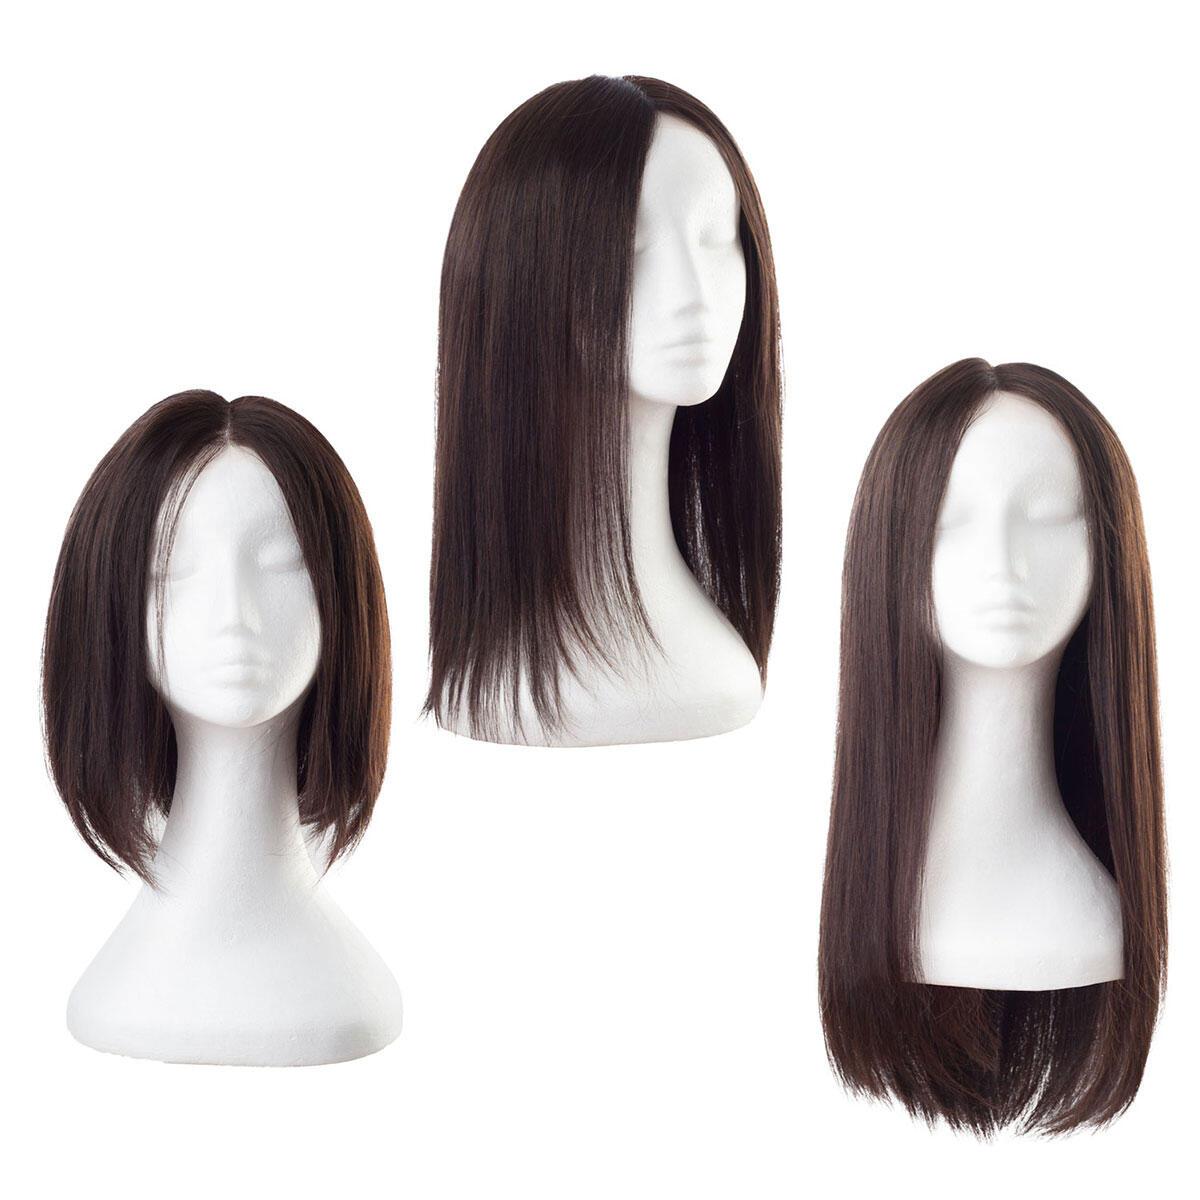 Lace Wig Human Hair 2.0 Dark Brown 55 cm